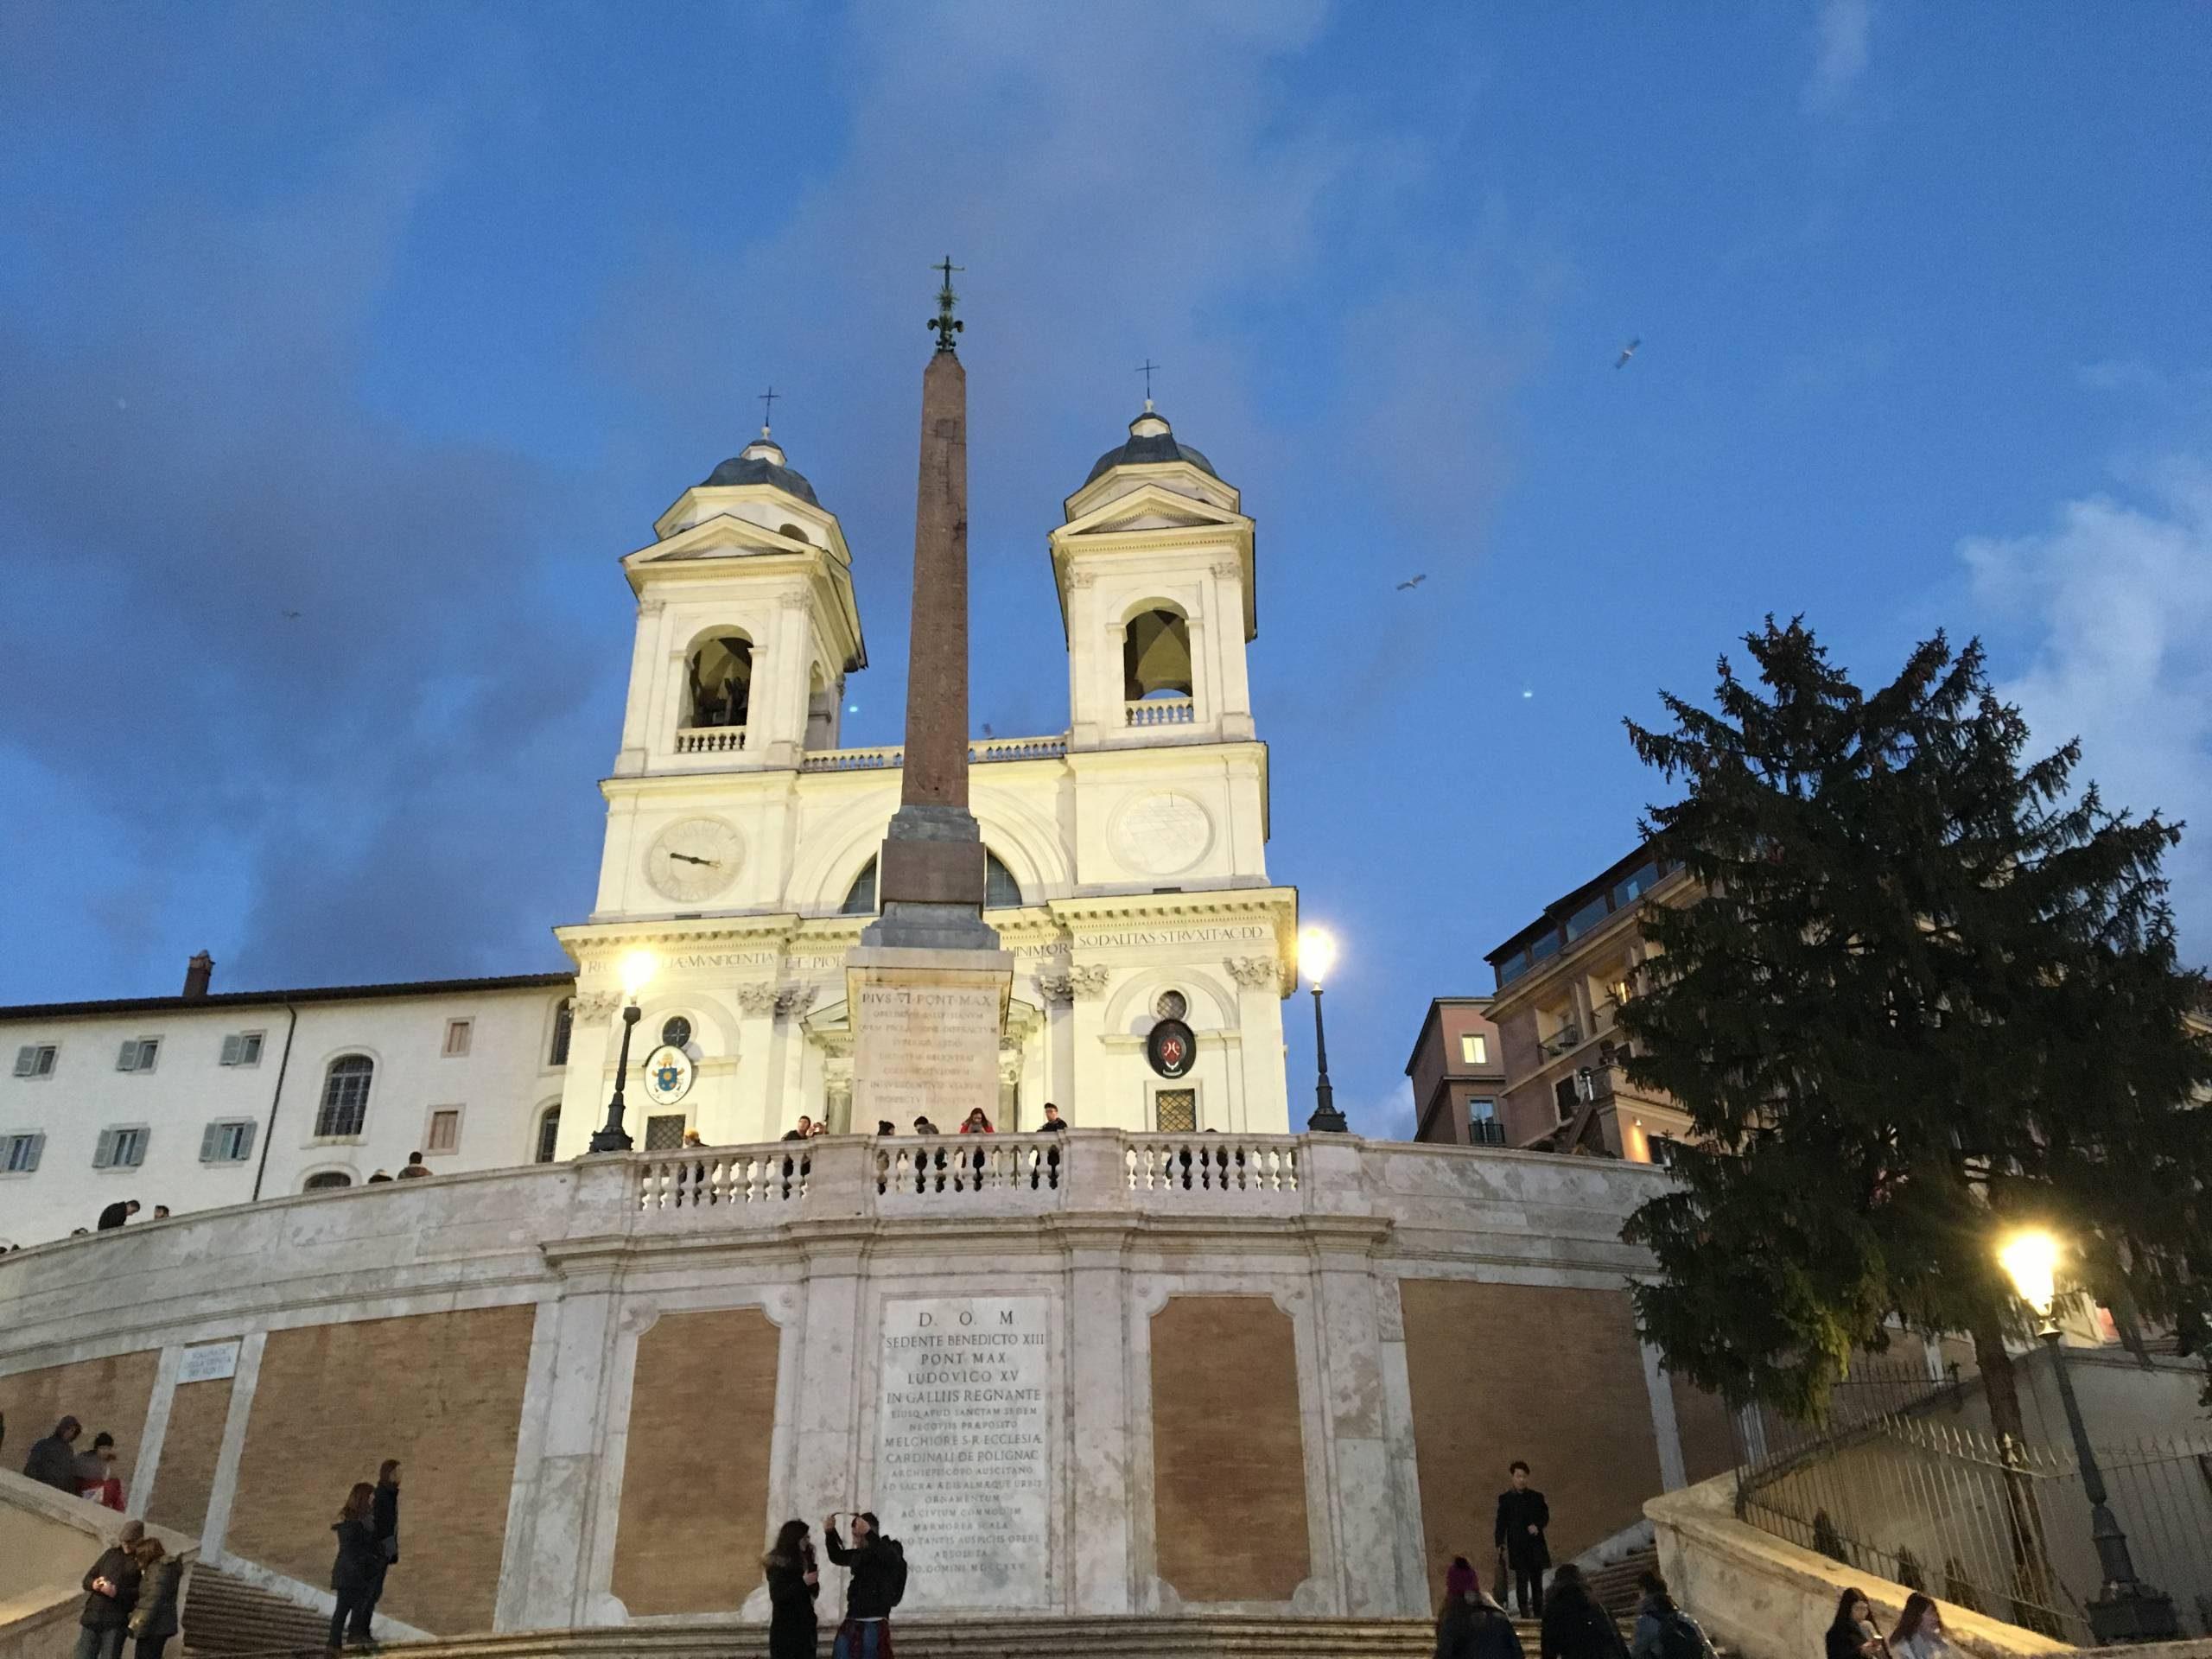 octobre dans le ciel de Rome.